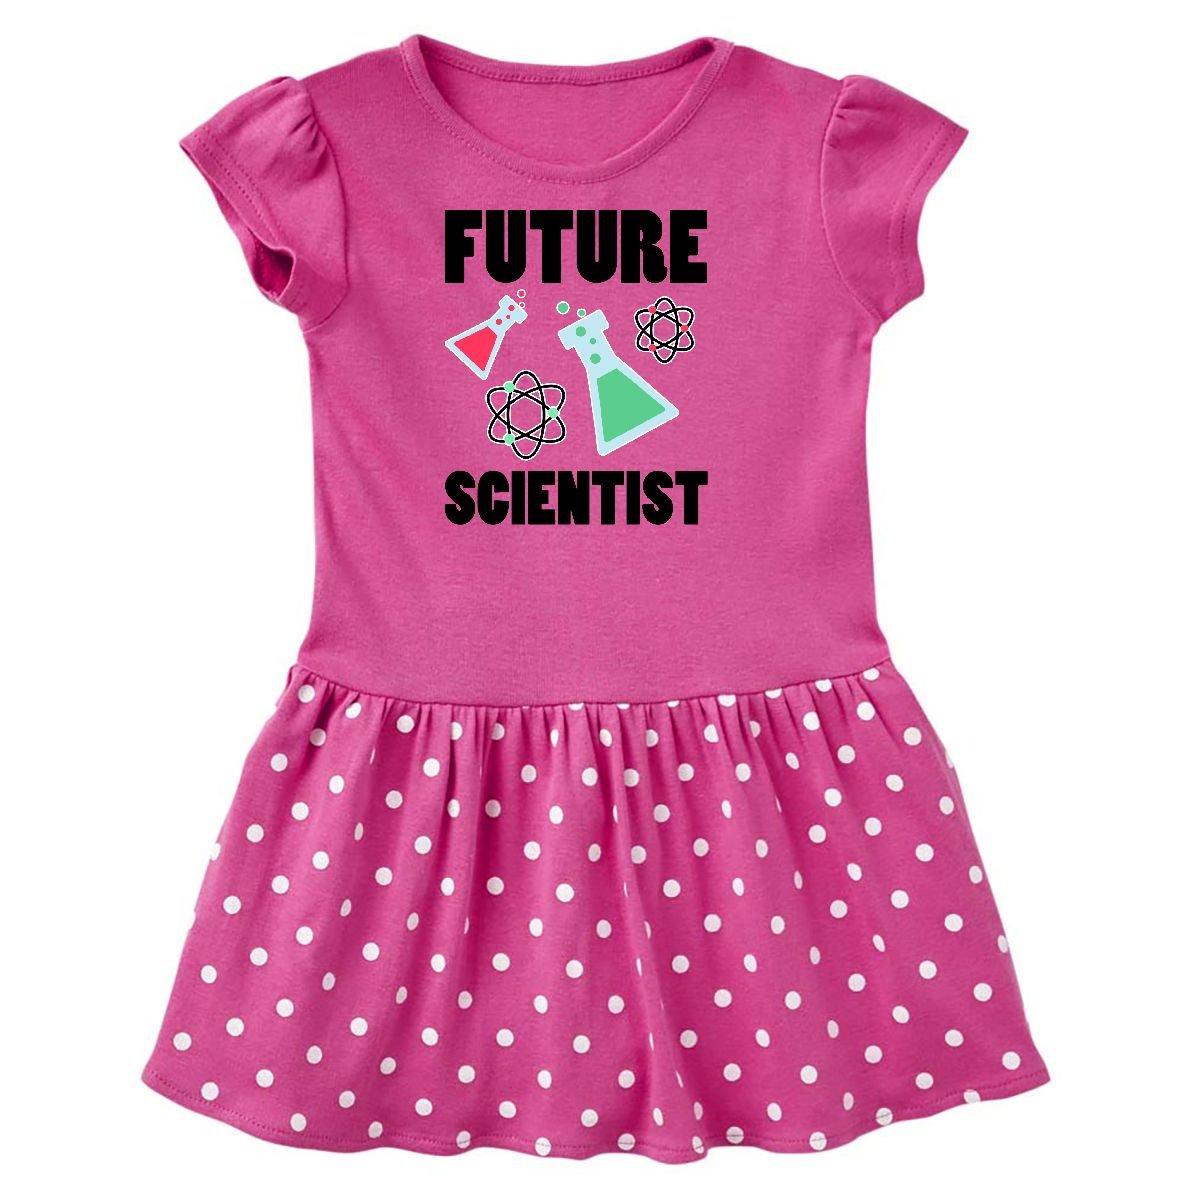 inktastic - Future Scientist Toddler Dress 14-167043-198